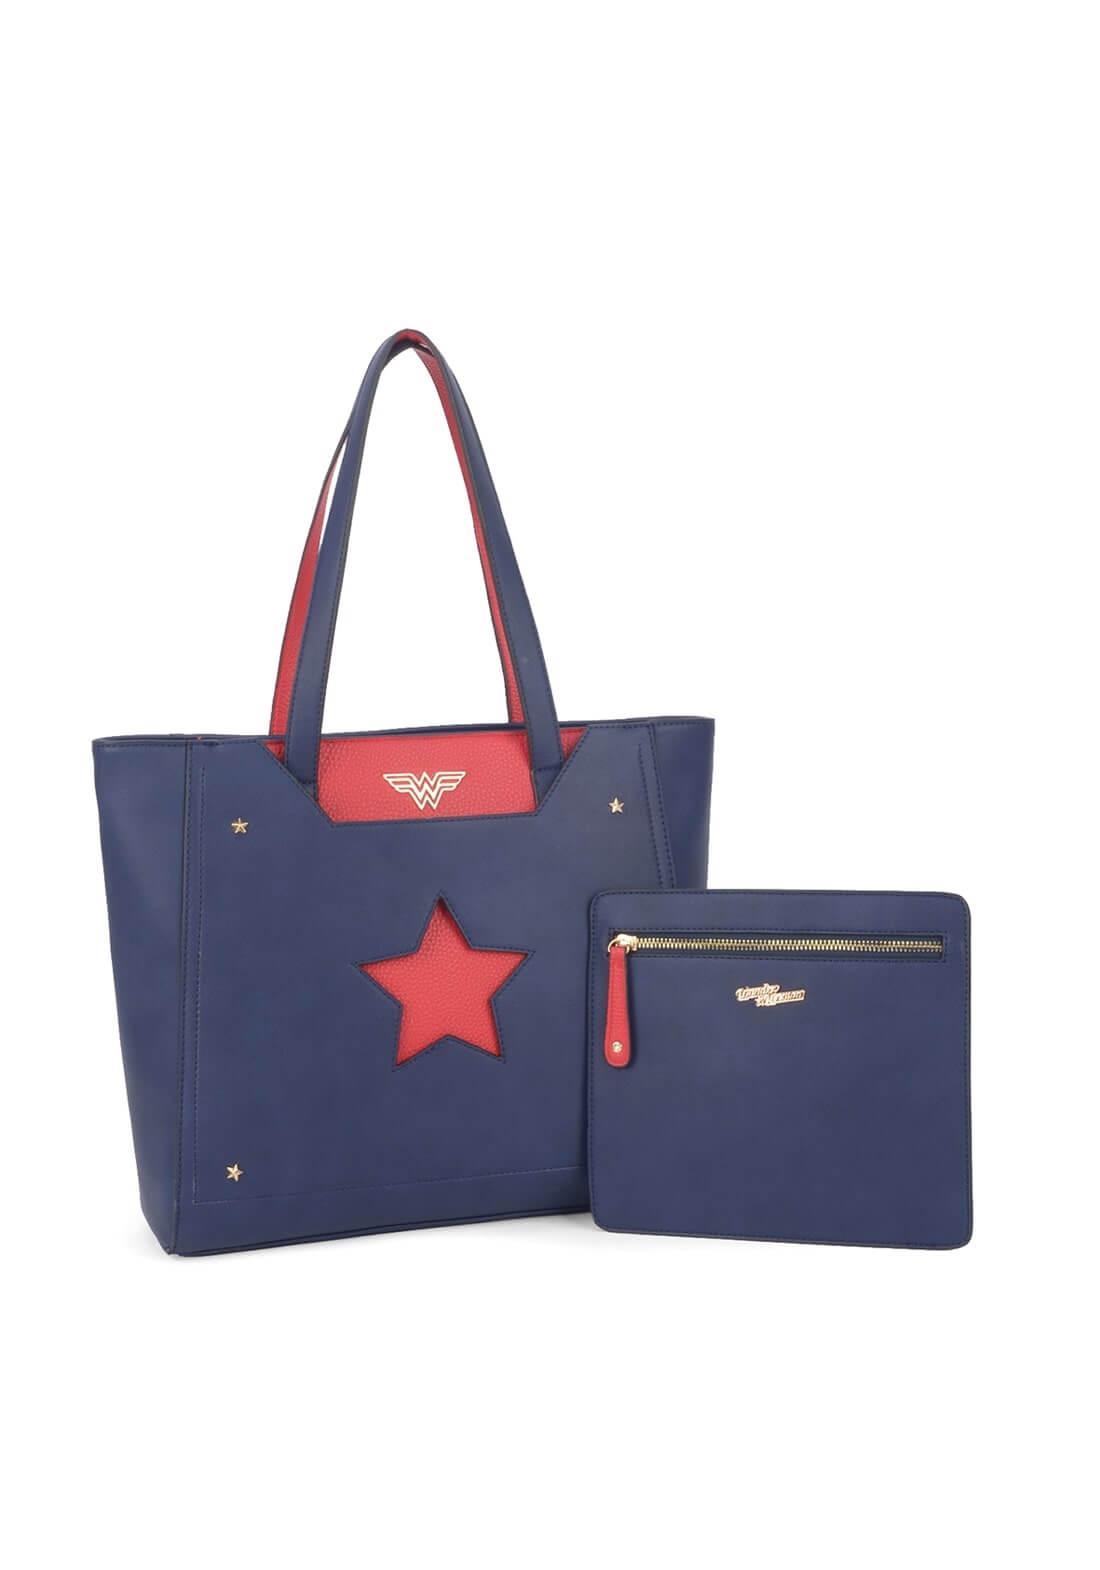 Bolsa de Ombro Wonder Woman Mulher Maravilha Star Necessaire Azul Vermelho